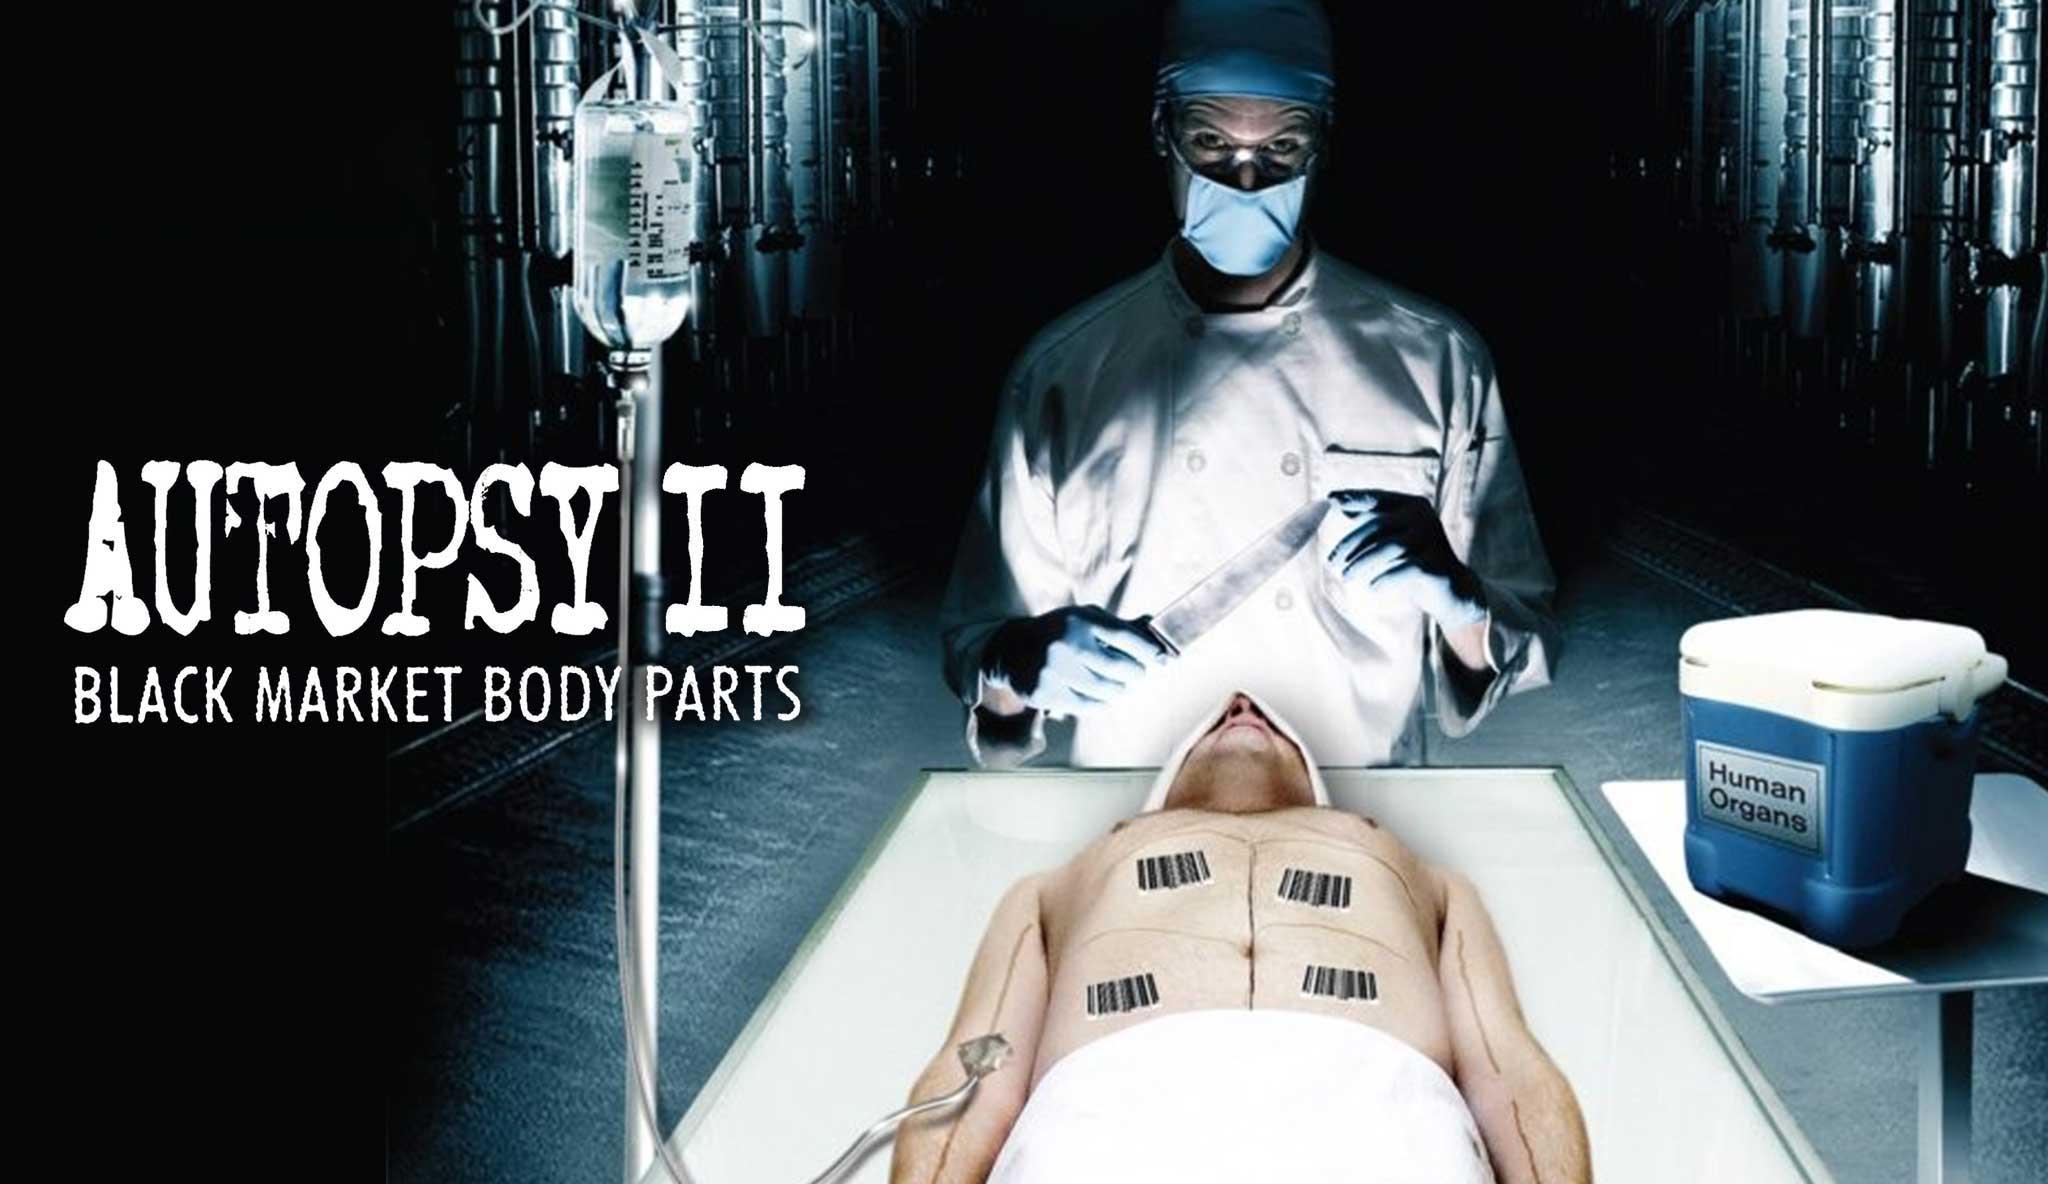 autopsy-ii-black-market-body-parts\header.jpg